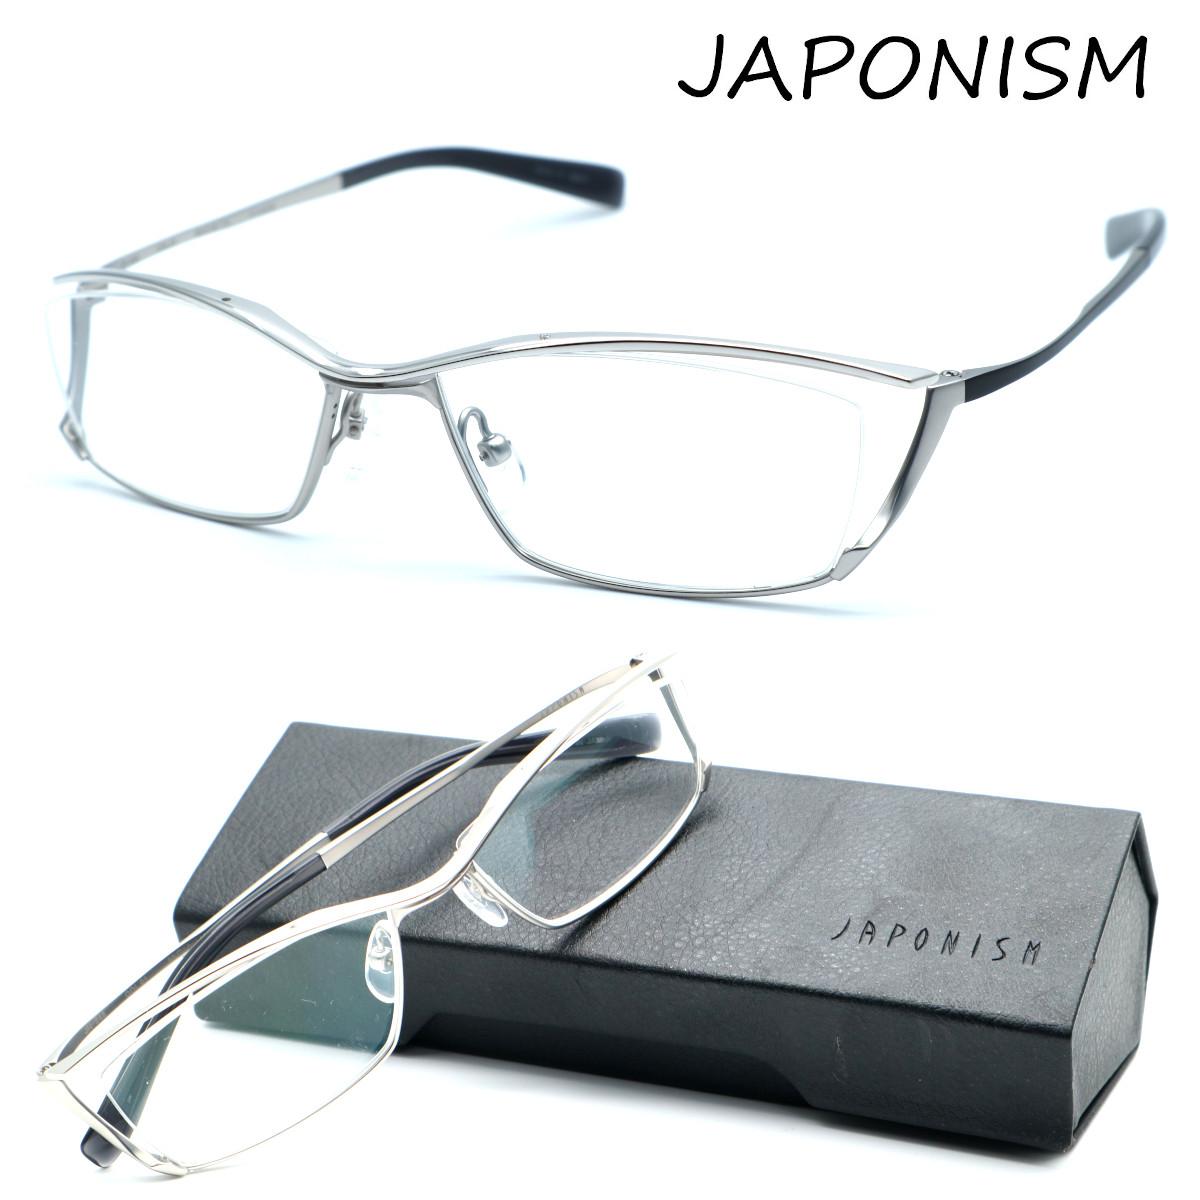 【JAPONISM】ジャポニズム メガネ JN-646 col.01 度付又は度無レンズ標準装備 MADE IN JAPAN【店内全品送料無料】